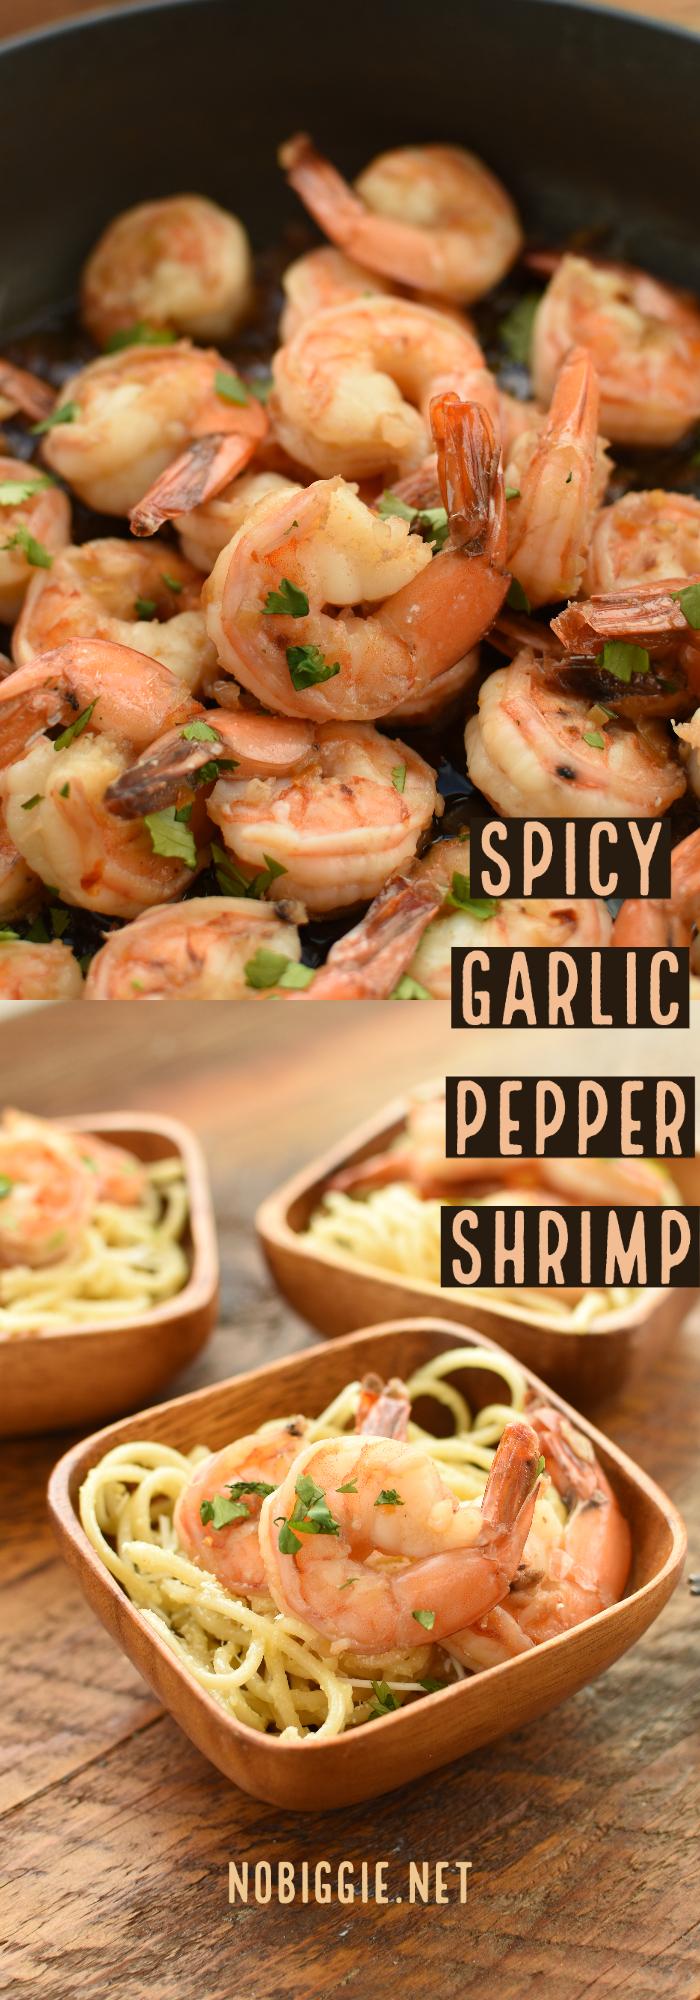 spicy garlic pepper shrimp   NoBiggie.net